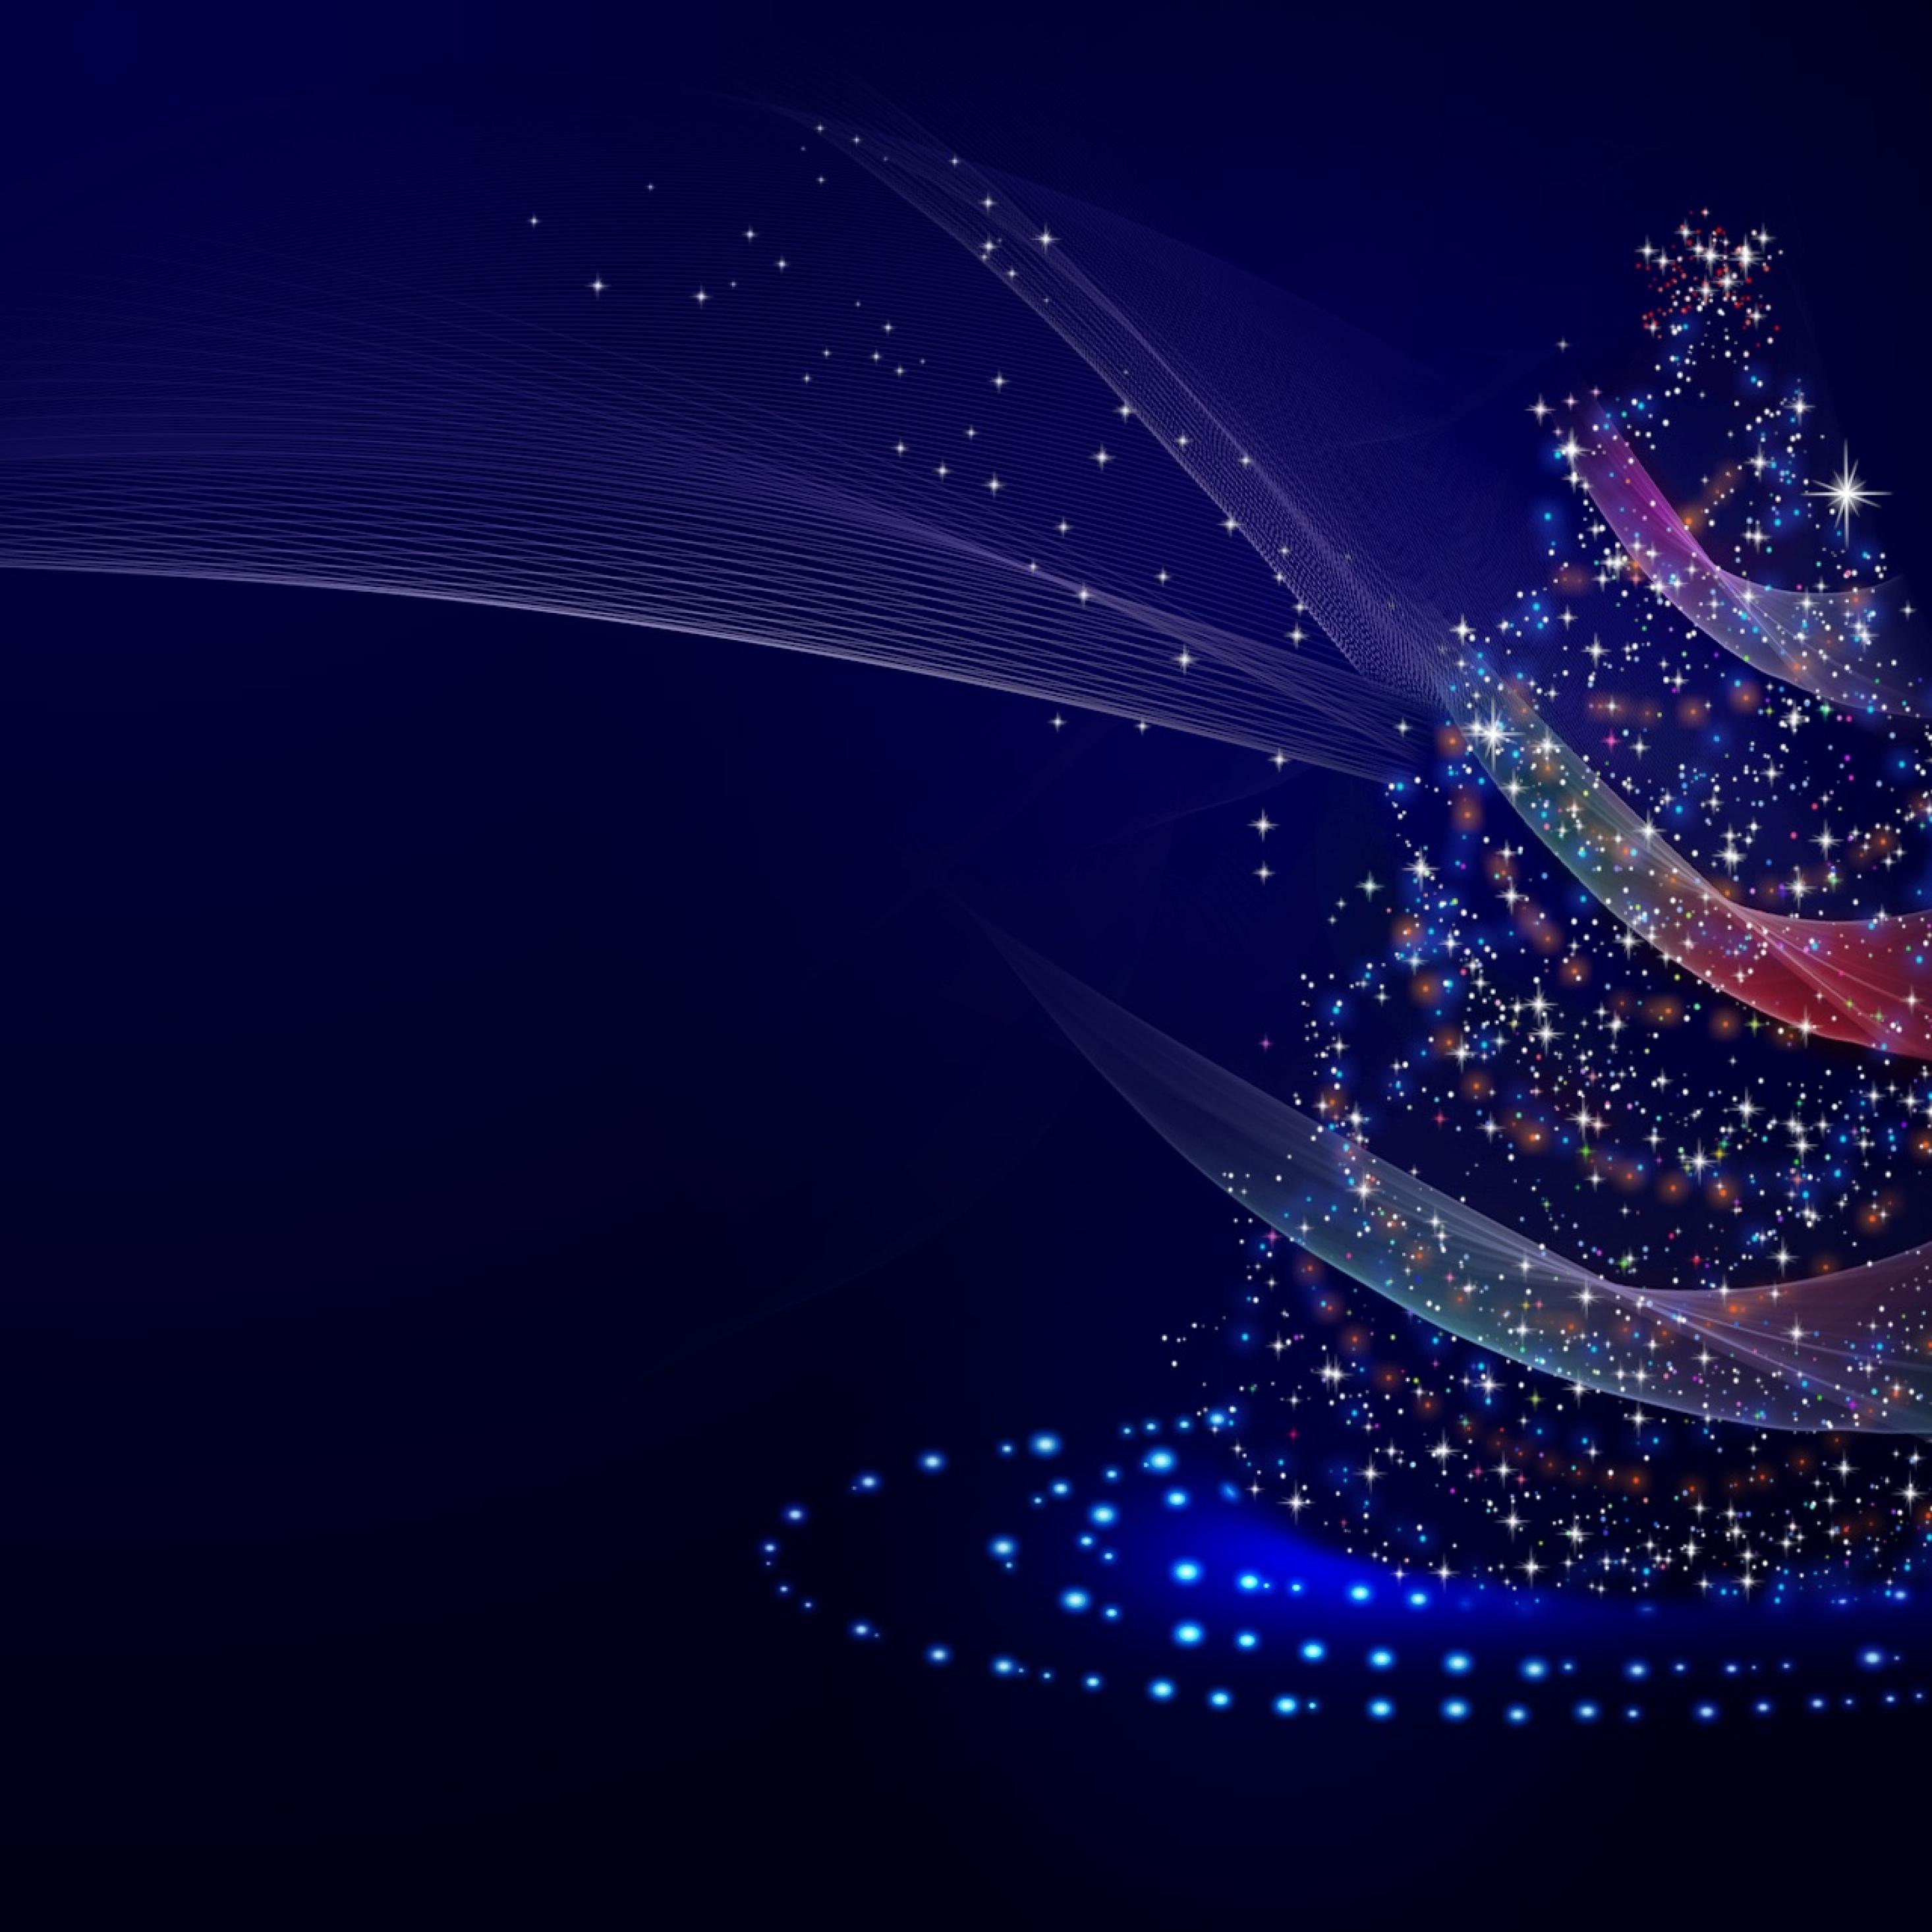 Blue Christmas Wallpaper Ipad